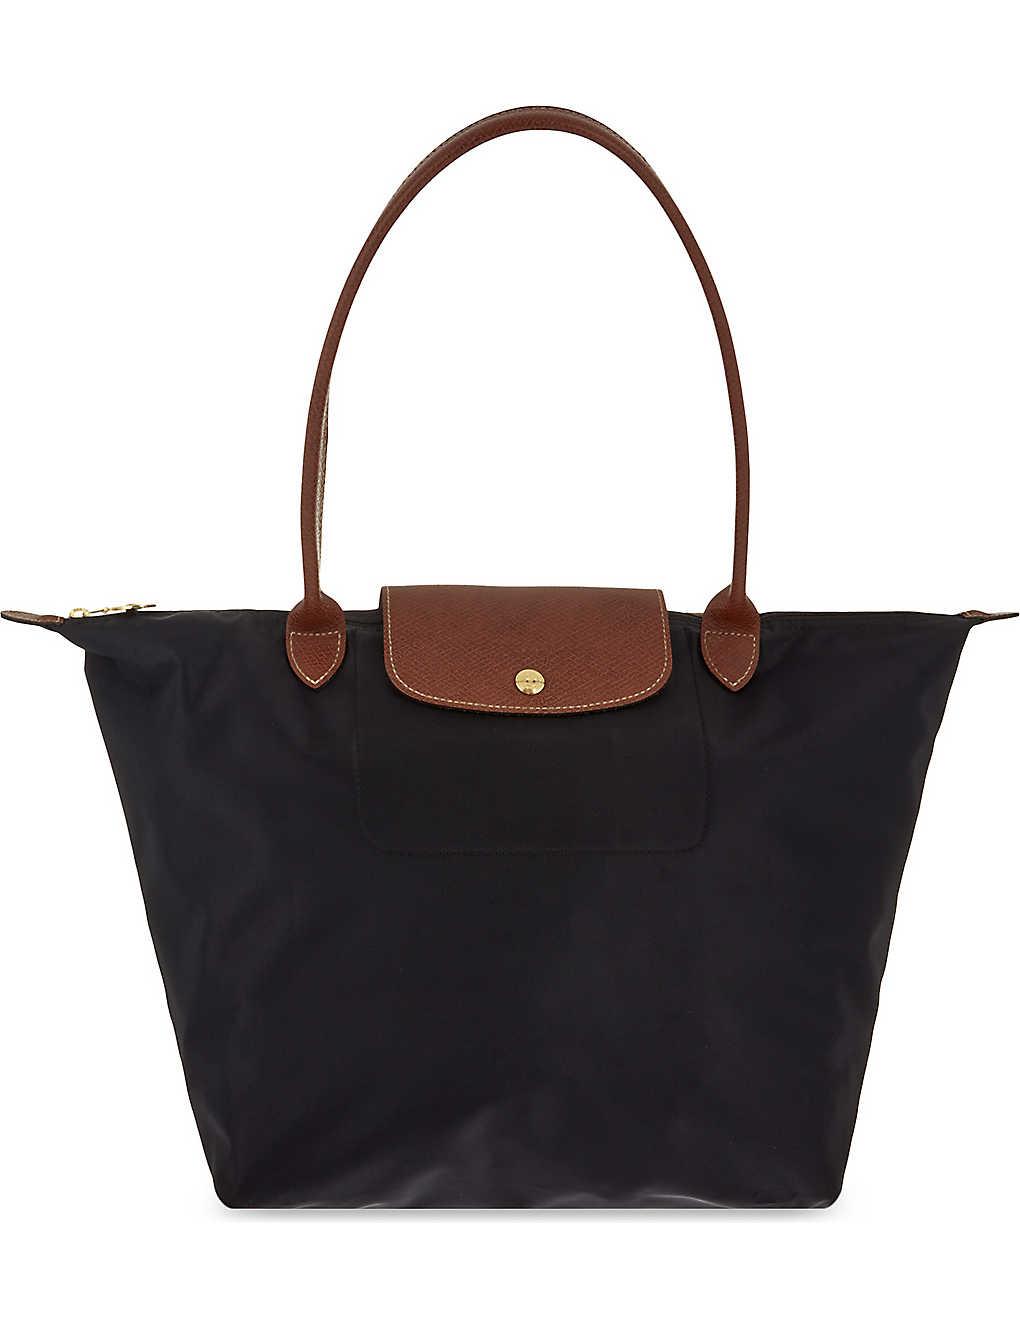 LONGCHAMP - Le Pliage large shopper bag  9f582e722a13a